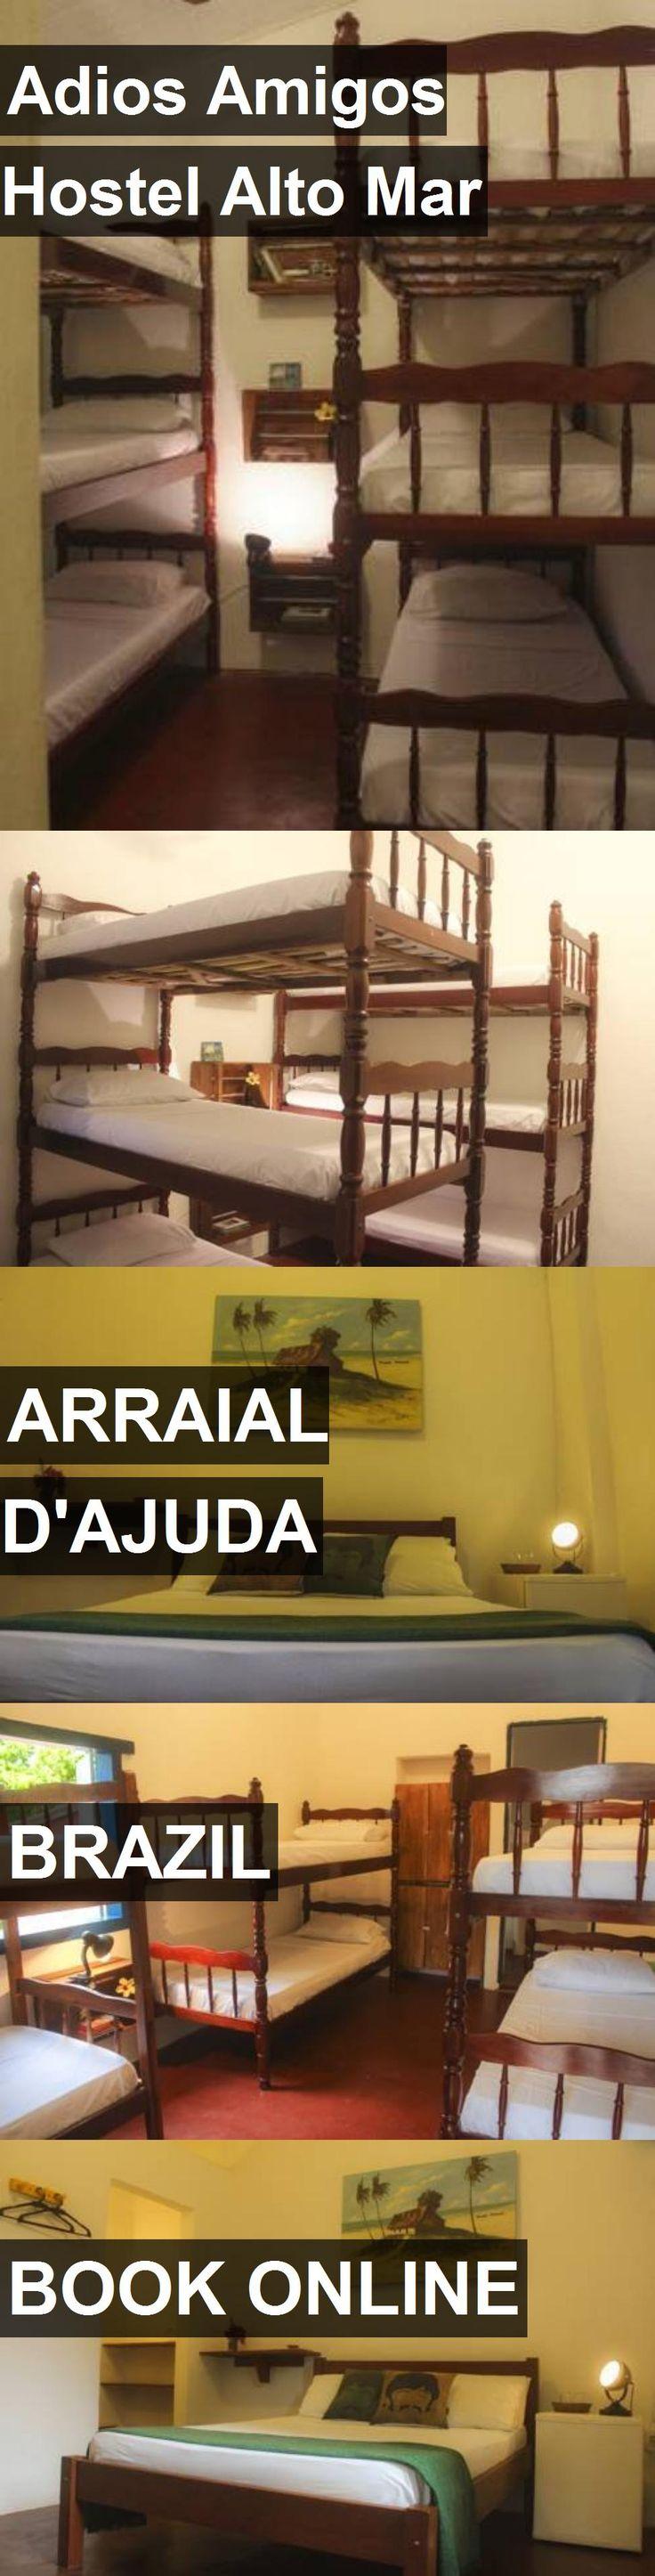 Adios Amigos Hostel Alto Mar in Arraial D'Ajuda, Brazil. For more information, photos, reviews and best prices please follow the link. #Brazil #ArraialD'Ajuda #travel #vacation #hostel